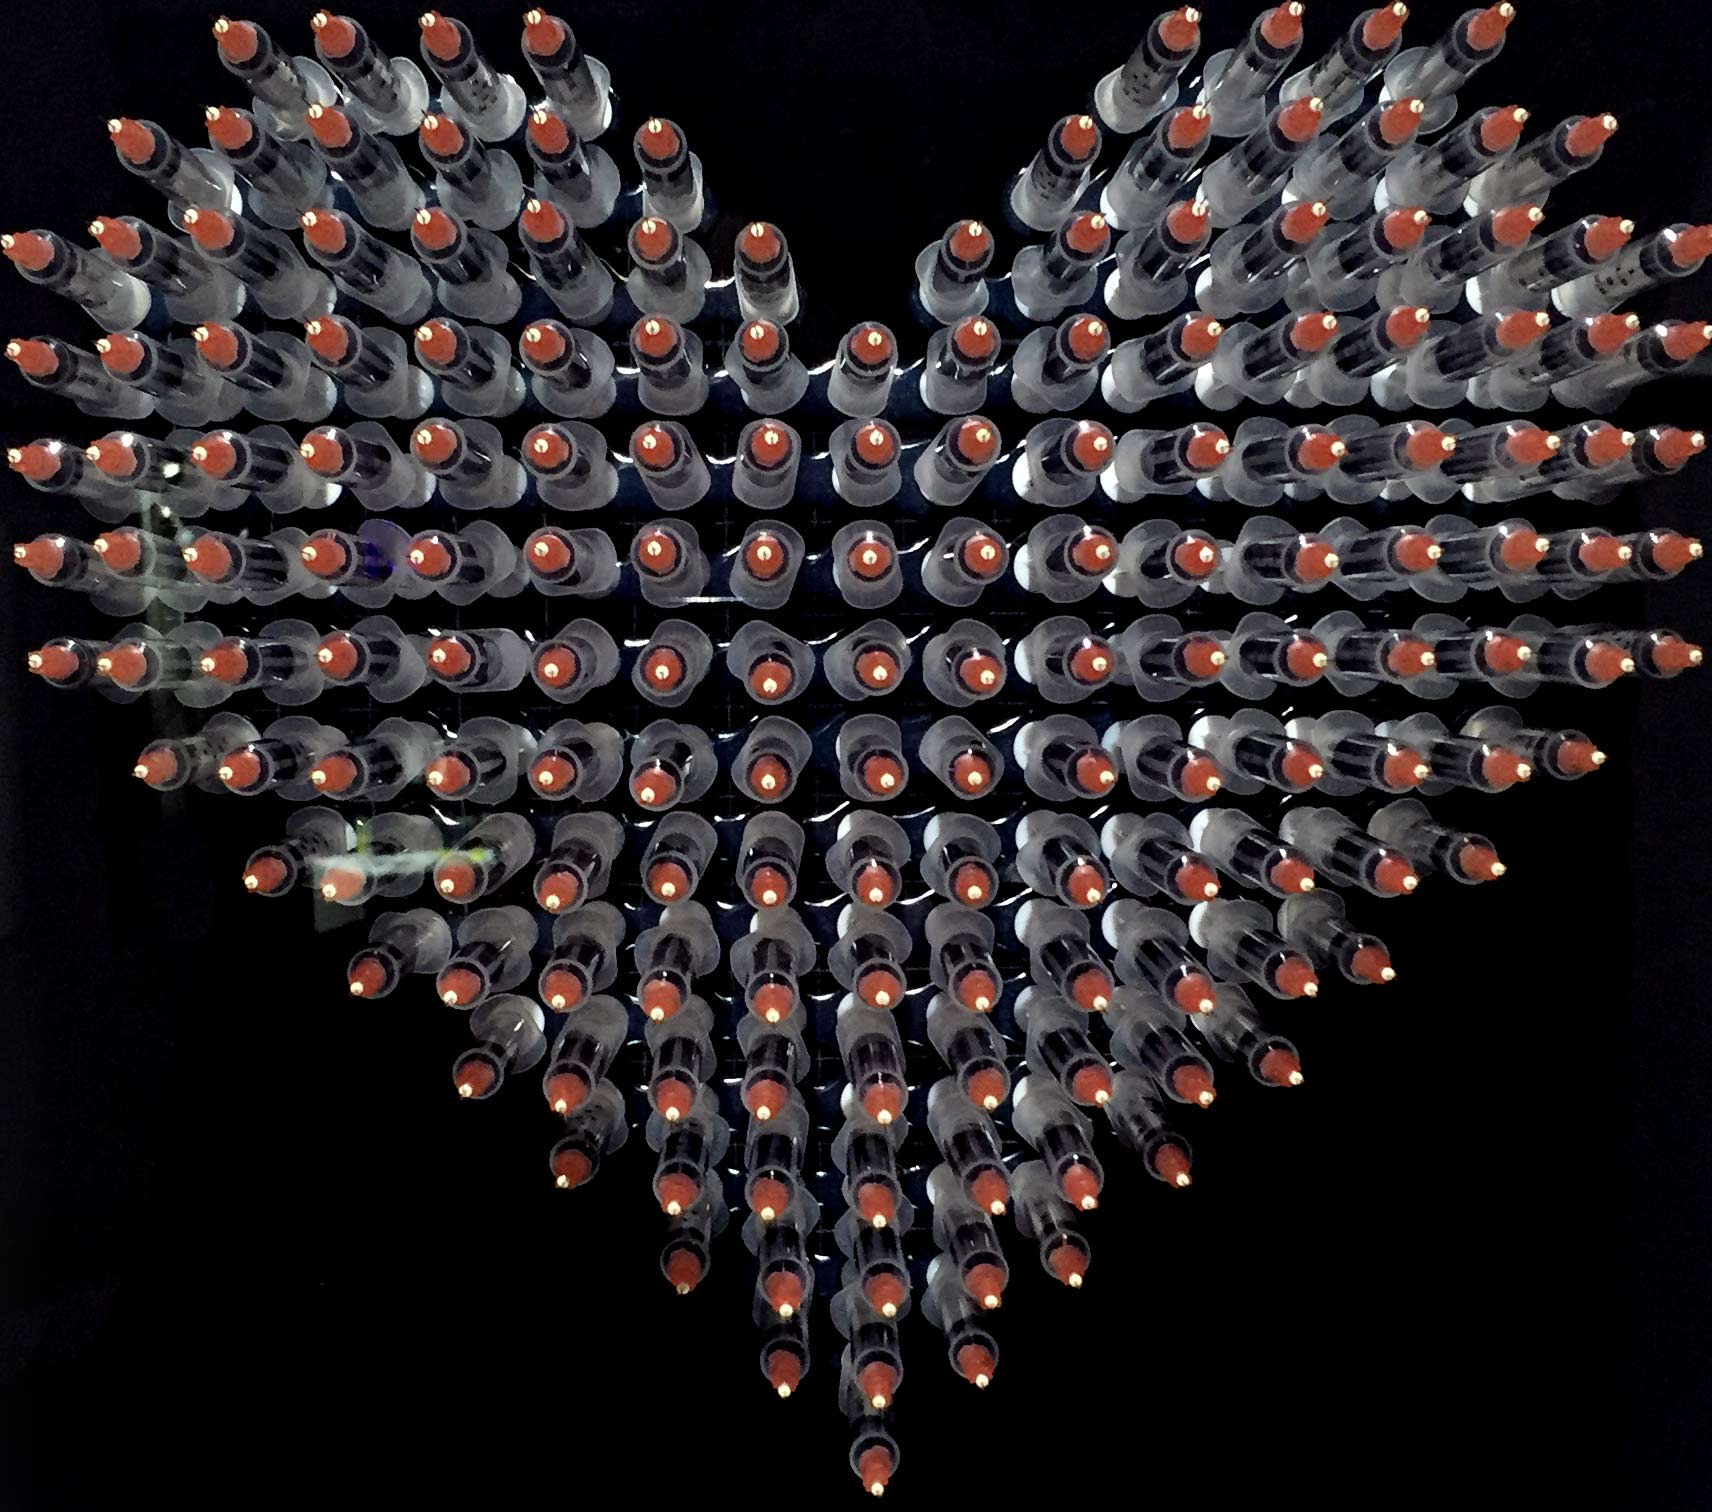 Heart - Anthony Moman